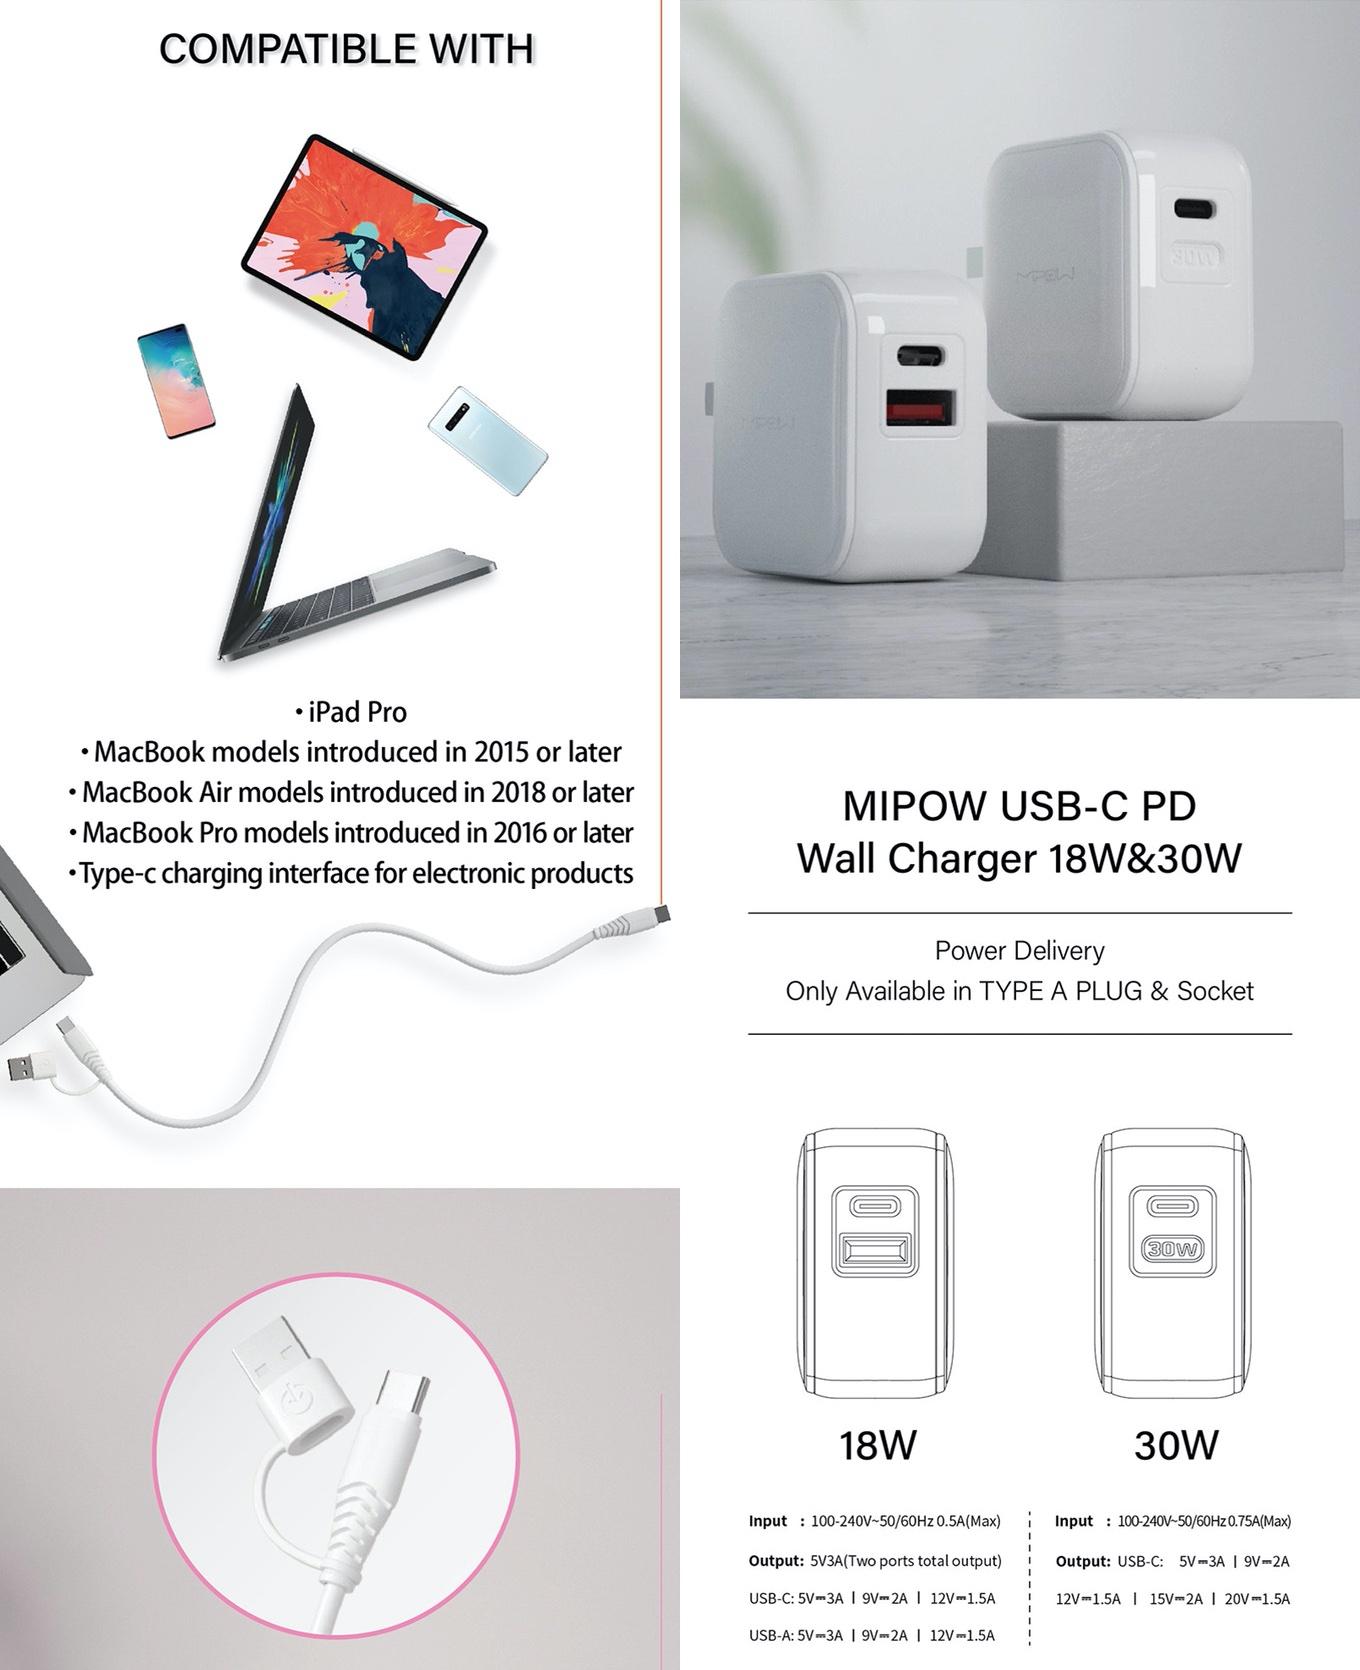 USB-C to USB-A